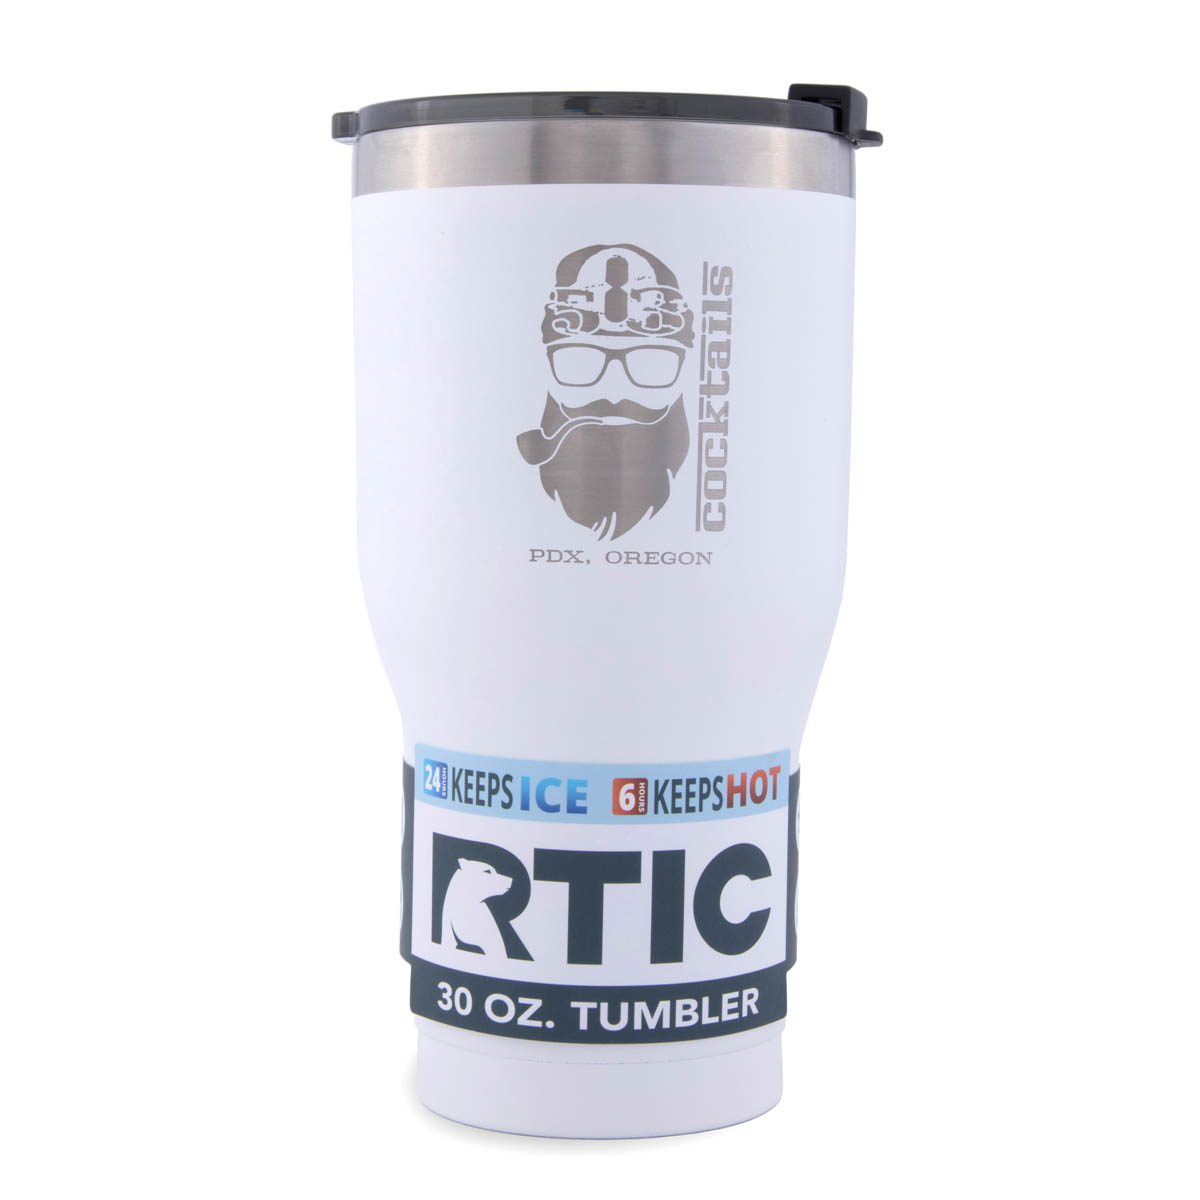 503 RTIC Tumbler